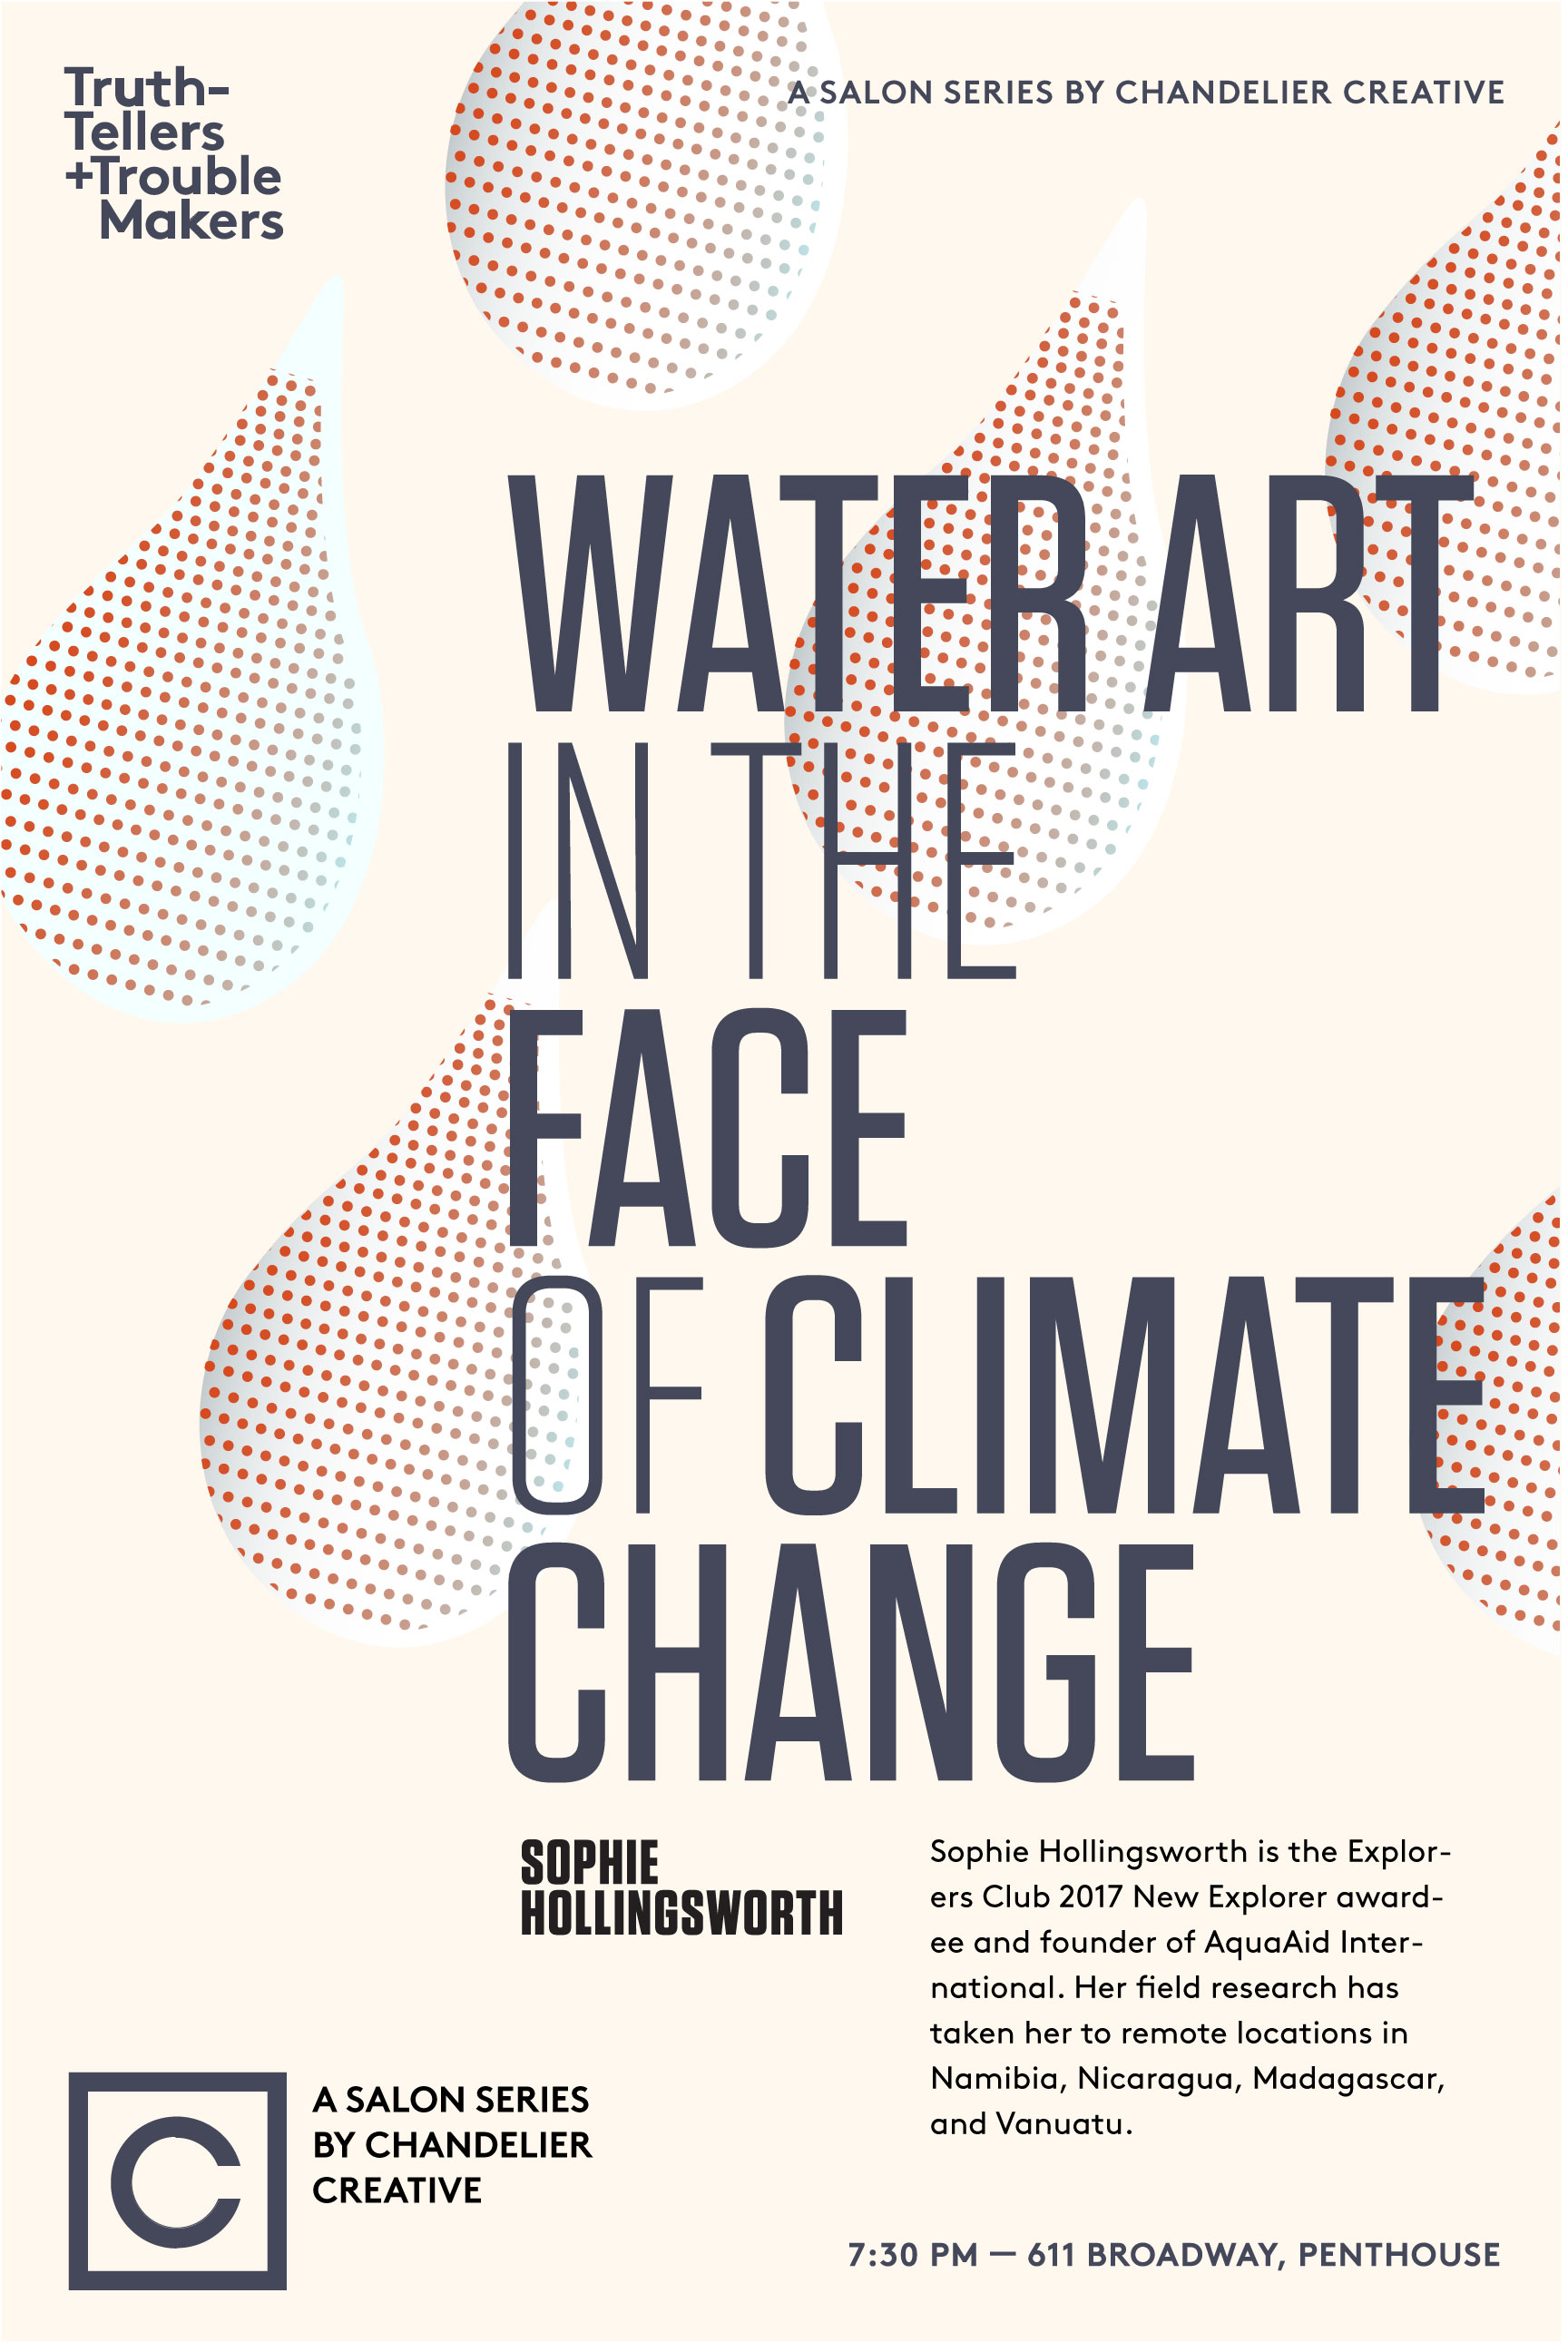 Water-Art2.jpg